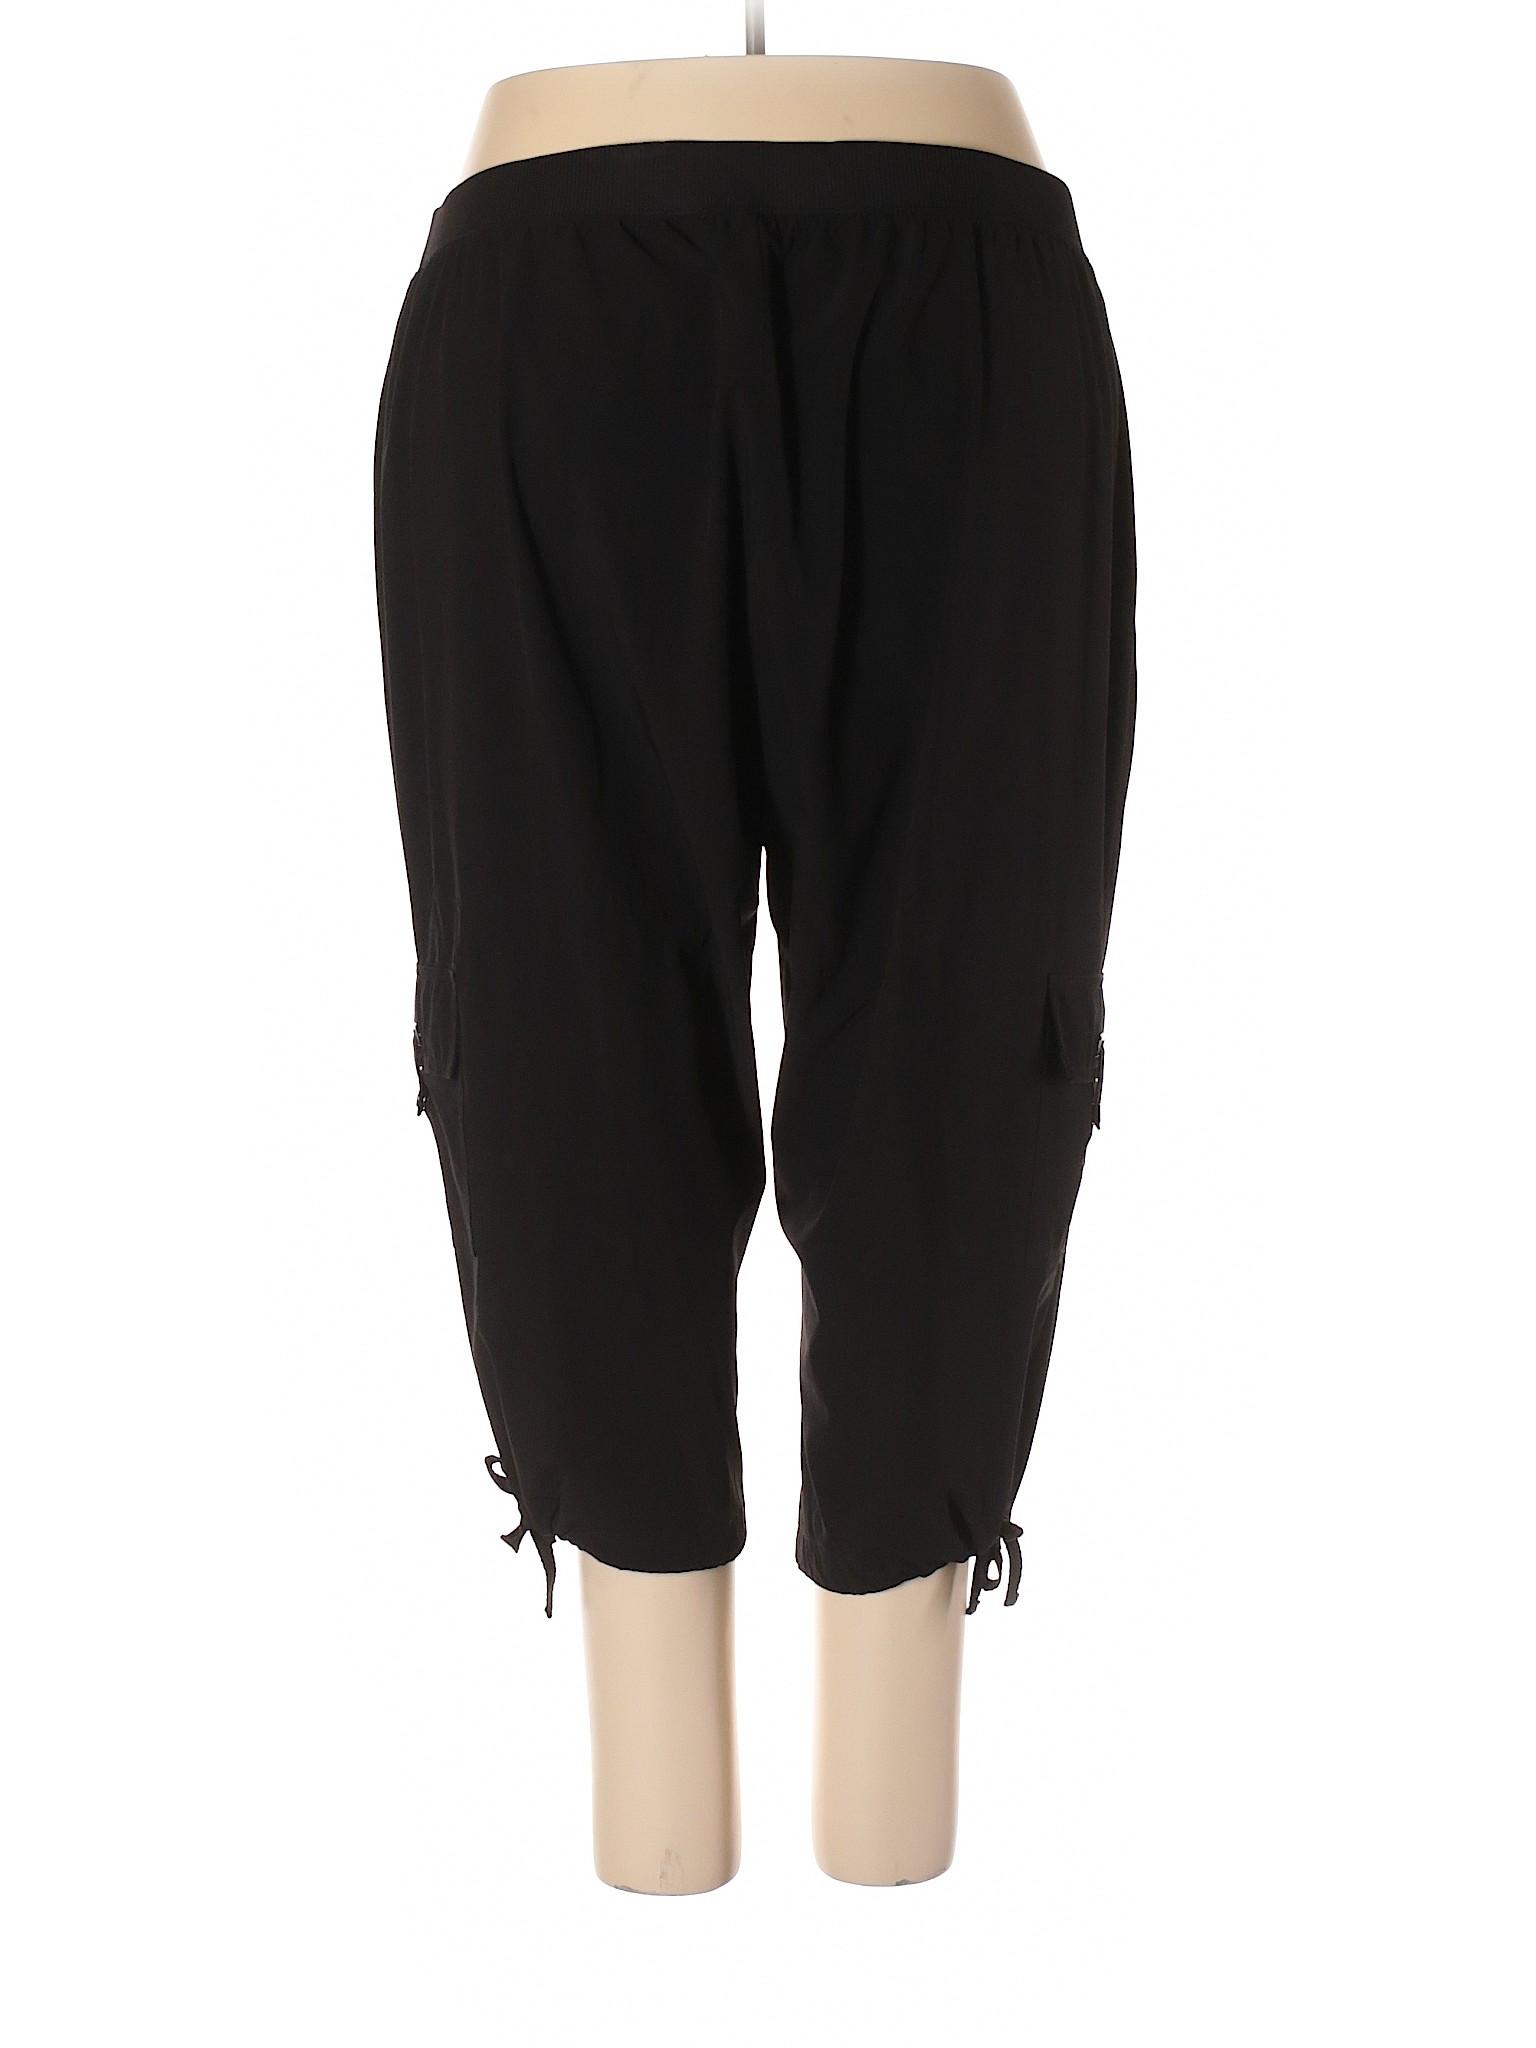 Pants Casual Boutique winter Ashley Laura xFxaRv